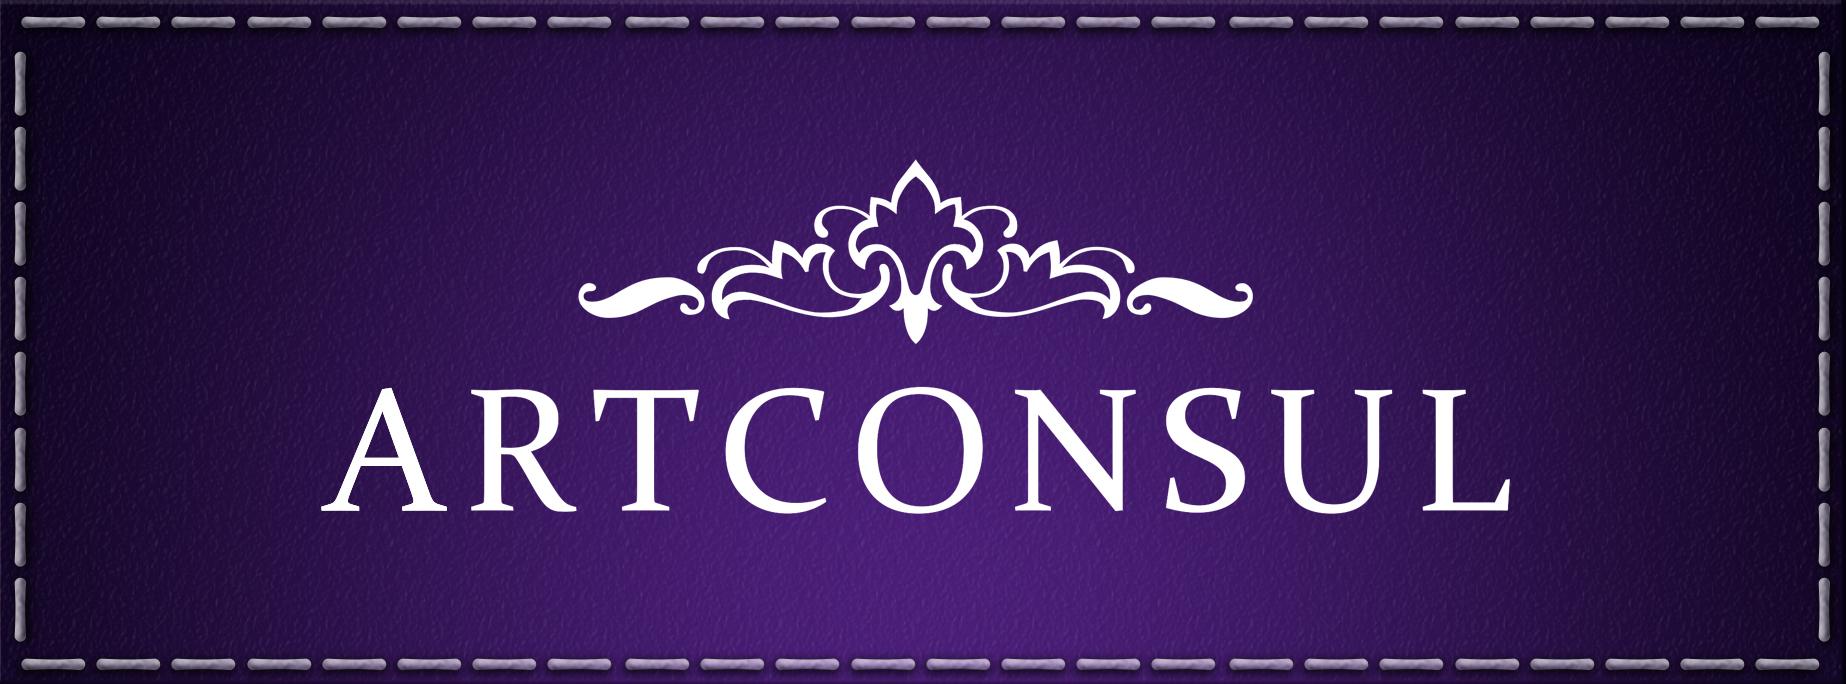 1_artconsul-logo.jpg